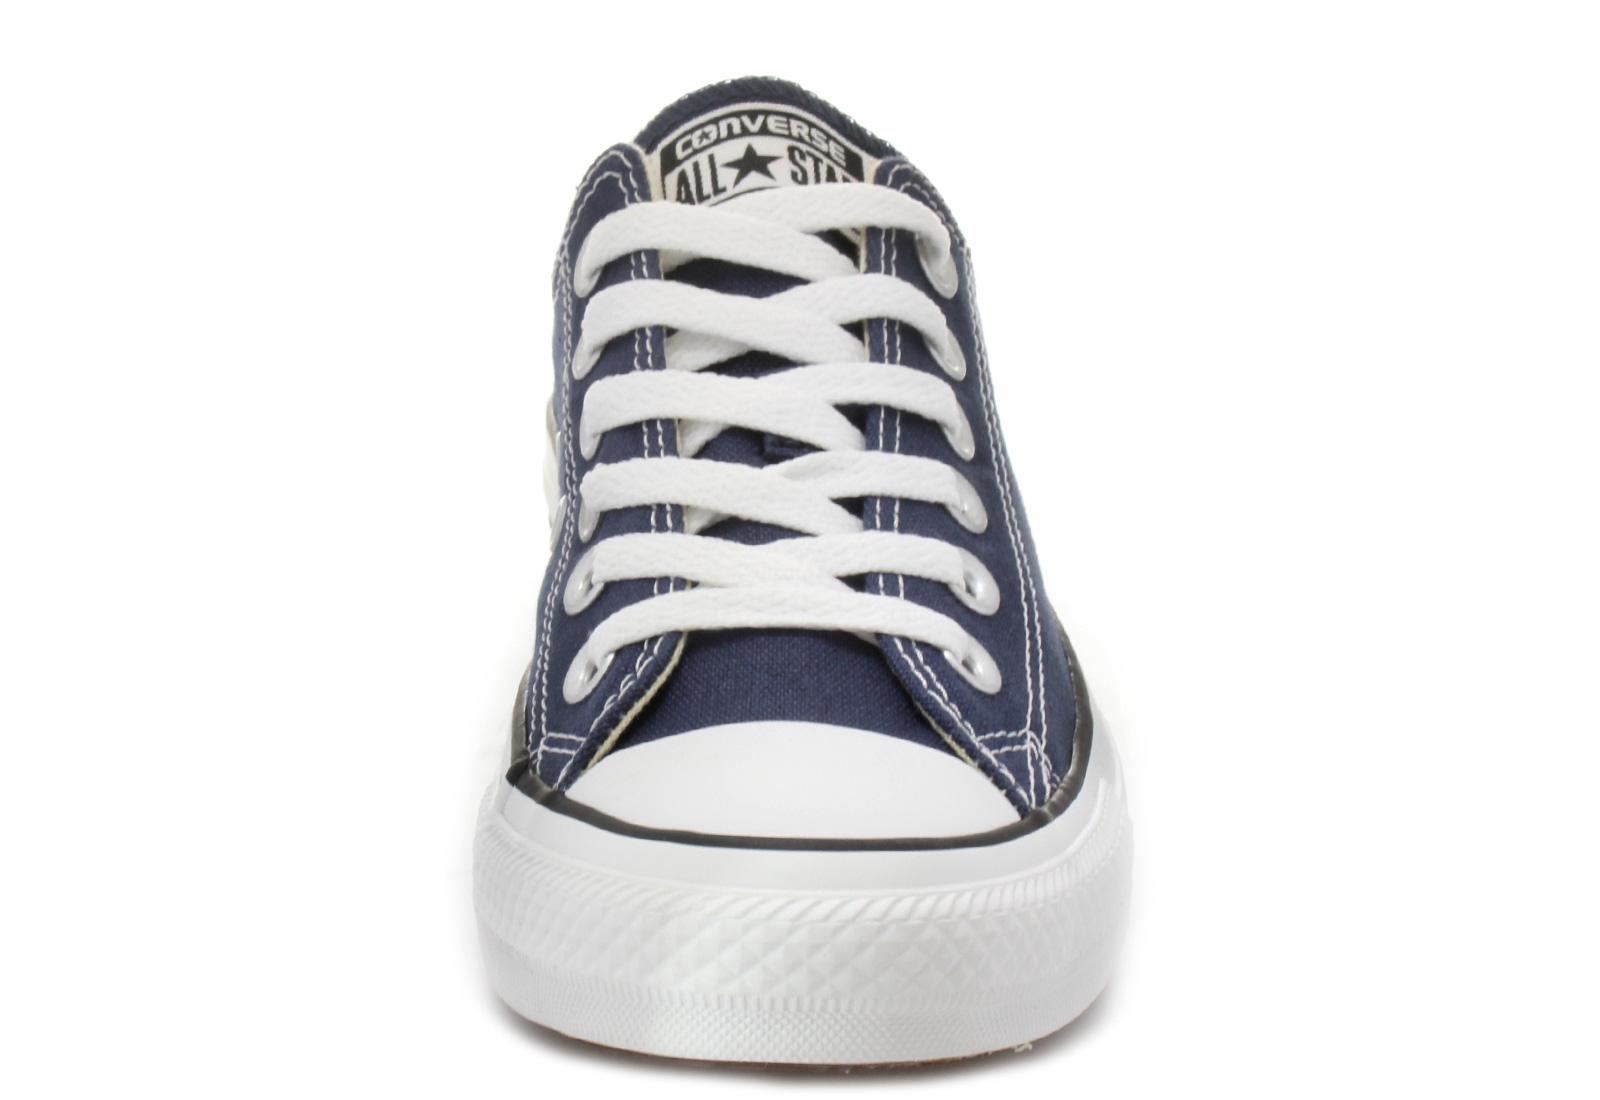 bfa17777ae96 Converse Tornacipő - Ct As Core Ox - M9697C - Office Shoes Magyarország